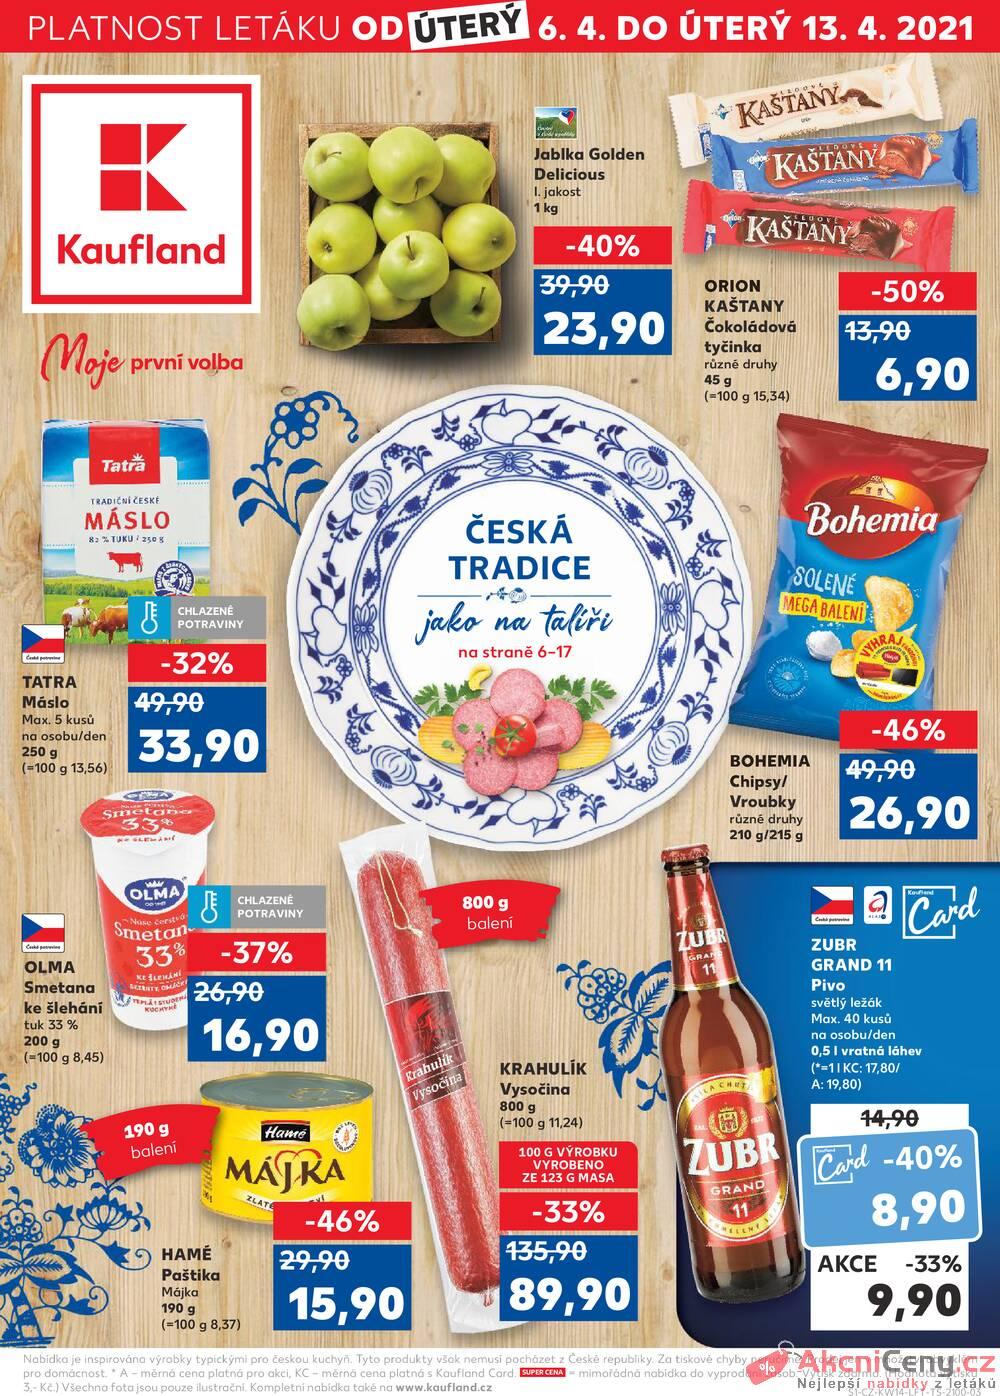 Leták Kaufland - Kaufland 6.4. - 13.4. - Kaufland - Ostrava - Zábřeh - strana 1